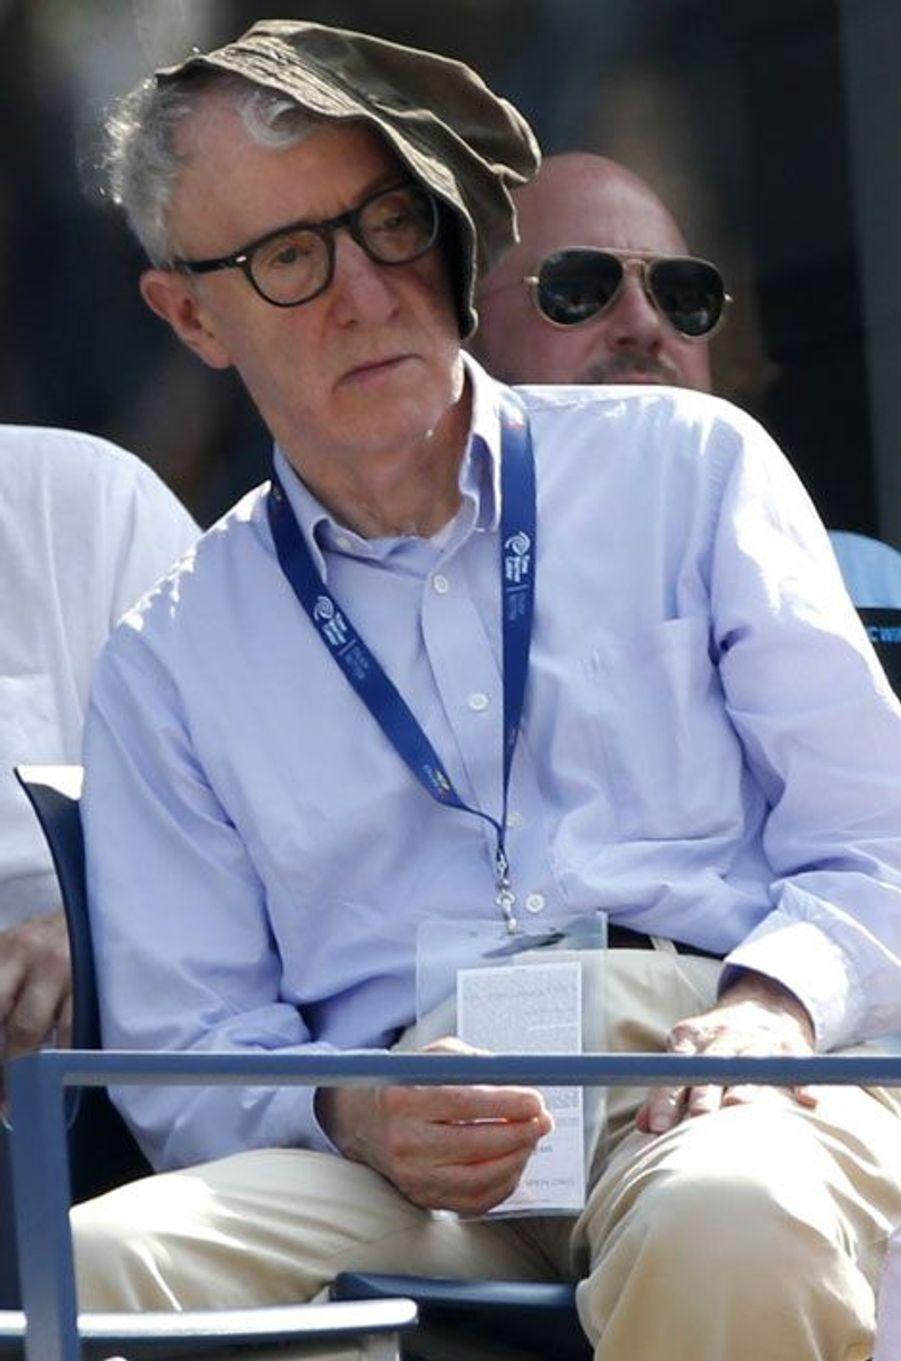 Woody Allen, spectateur un poil assoupi de la rencontre Djokovic - Nishikori lors de l'U.S. Open.